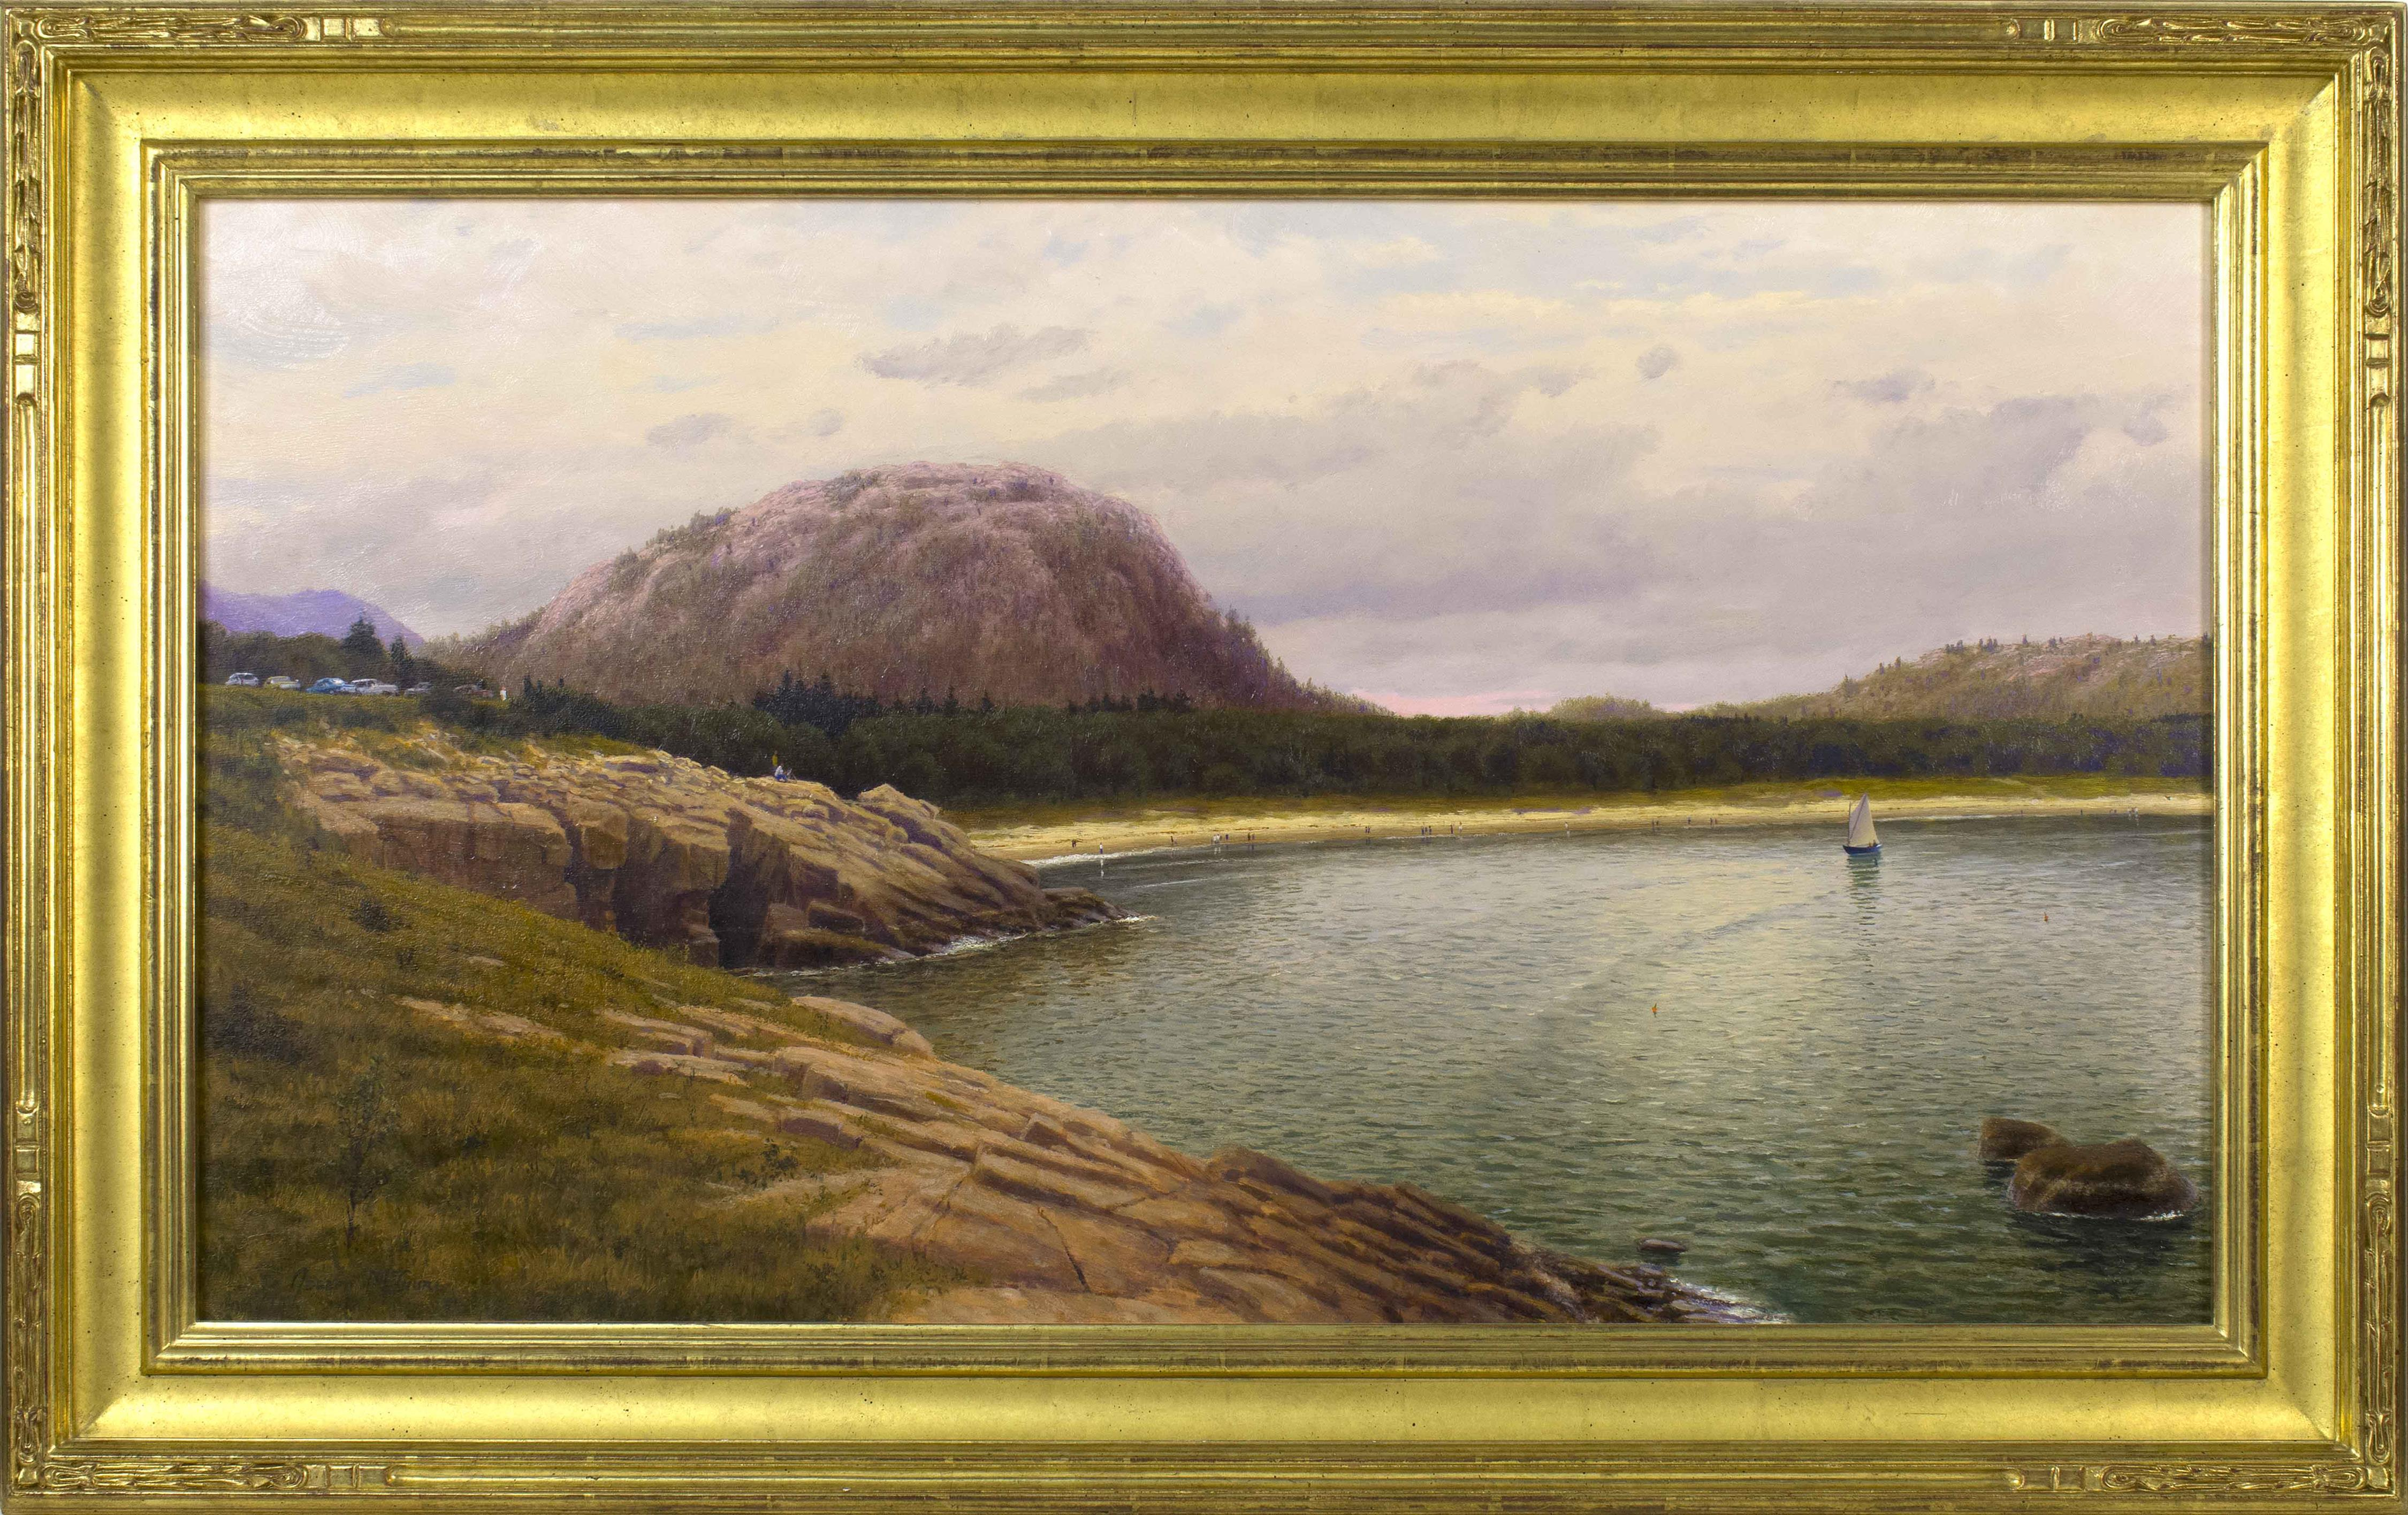 "JOSEPH MCGURL, Massachusetts, b. 1958, Sand Beach, Mount Desert Island, Maine., Oil on board, 20"" x 36"". Framed 26"" x 42.5""."